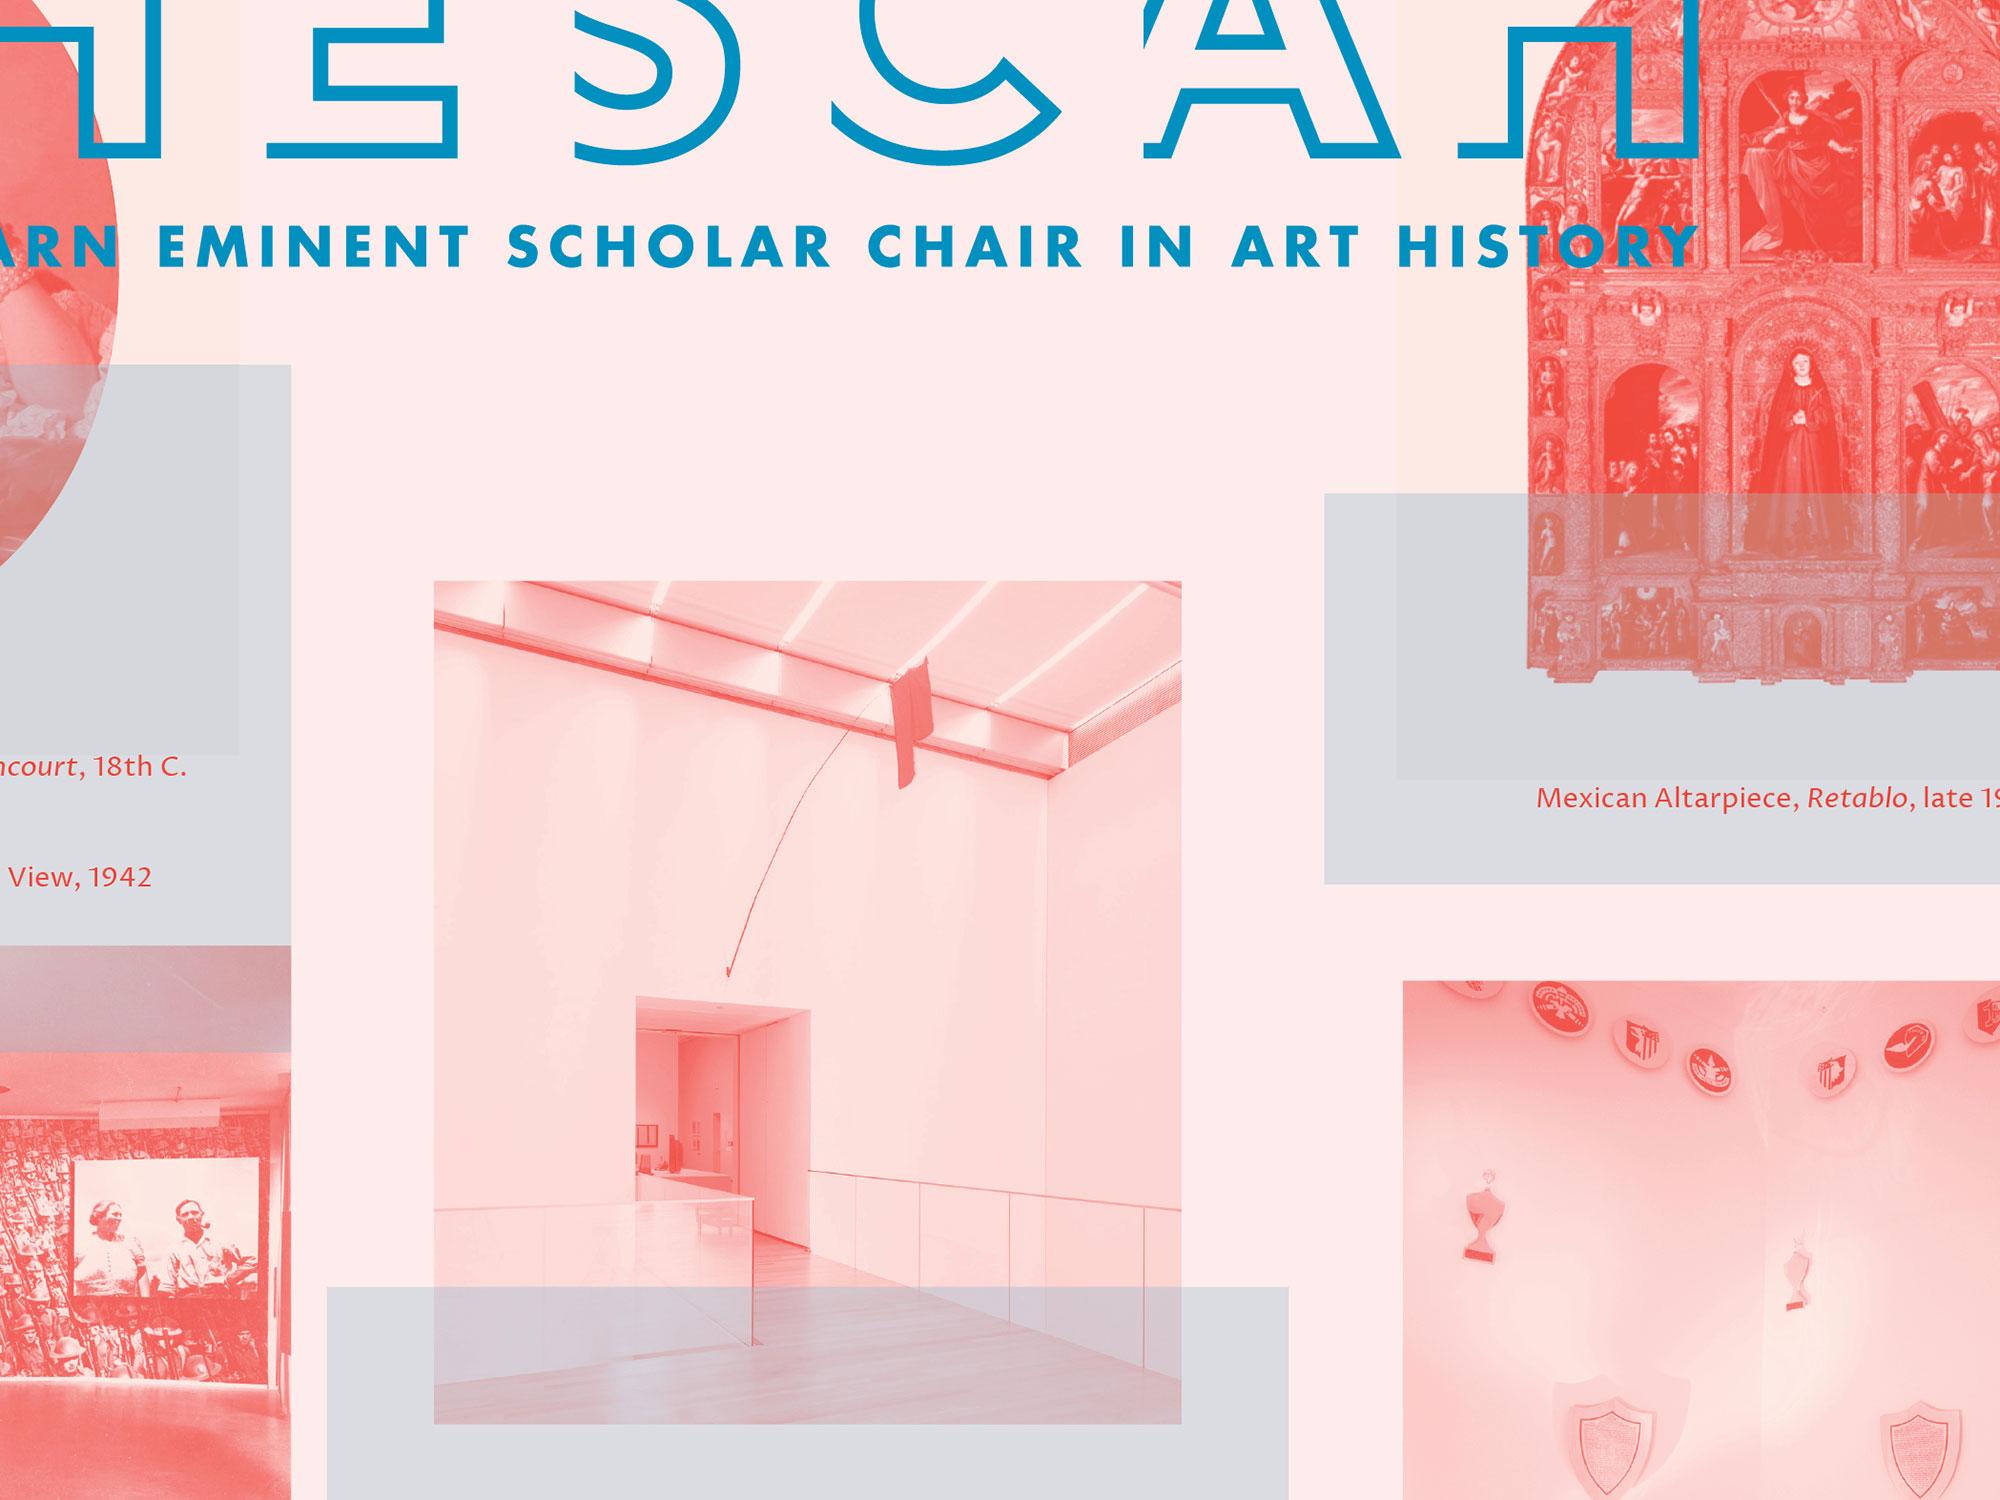 HESCAH / University of Florida Poster Series